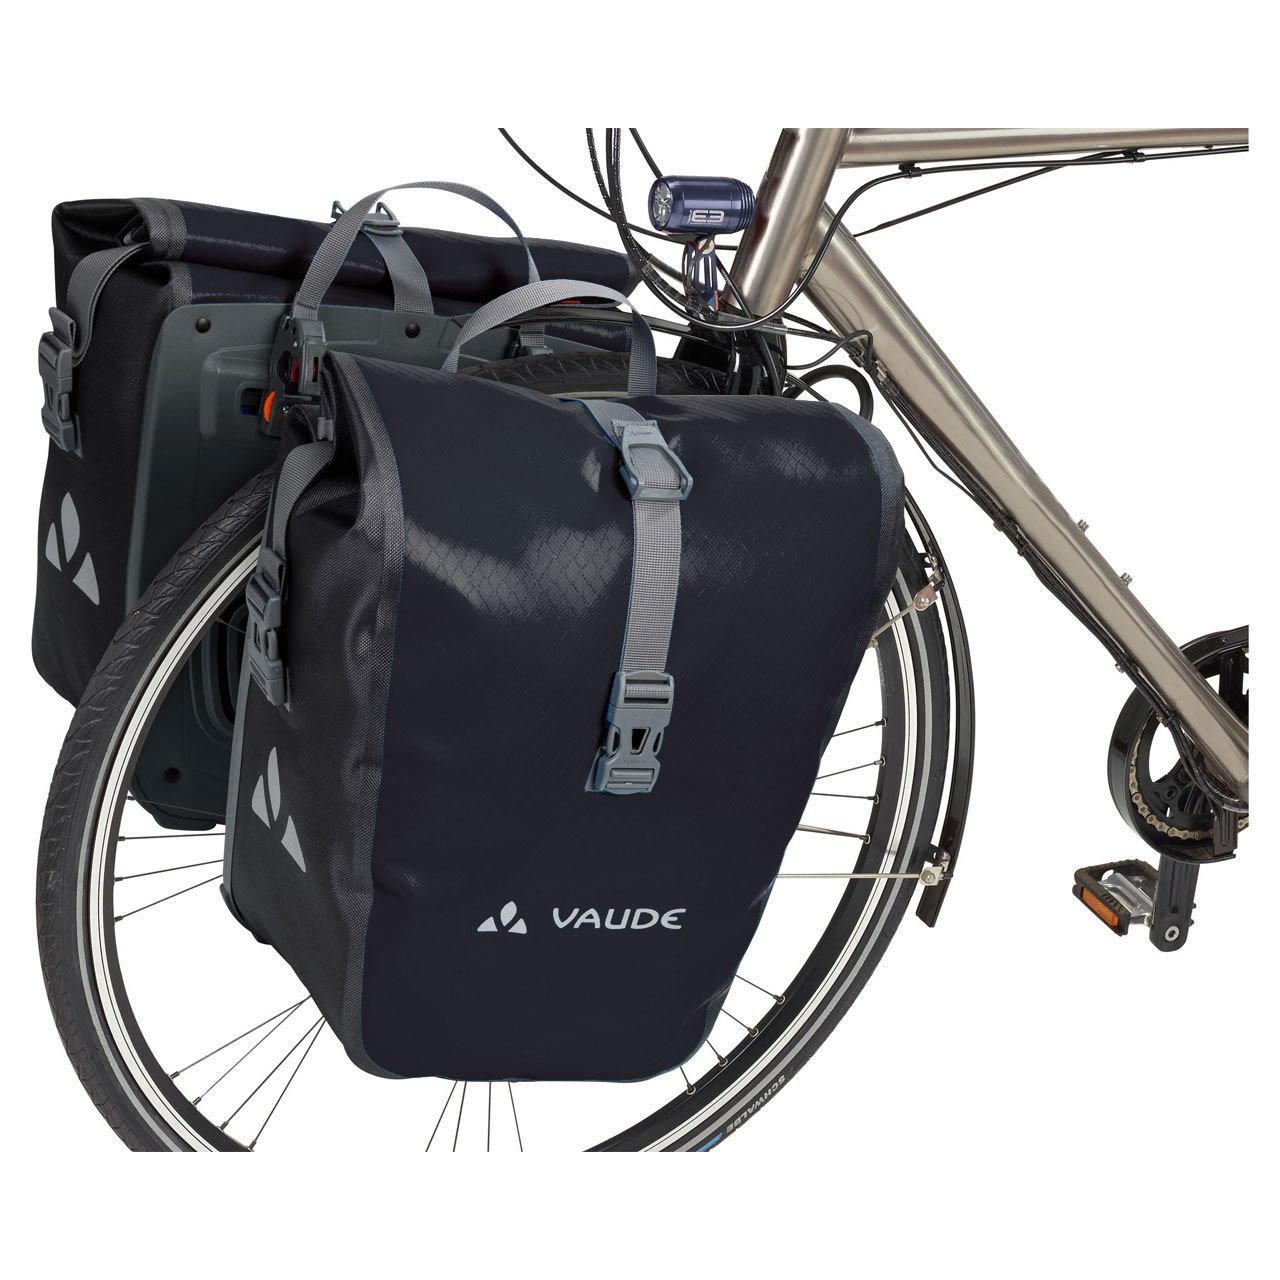 VAUDE Aqua Front - Fahrradtaschen zum Radfahren - 2 Stück